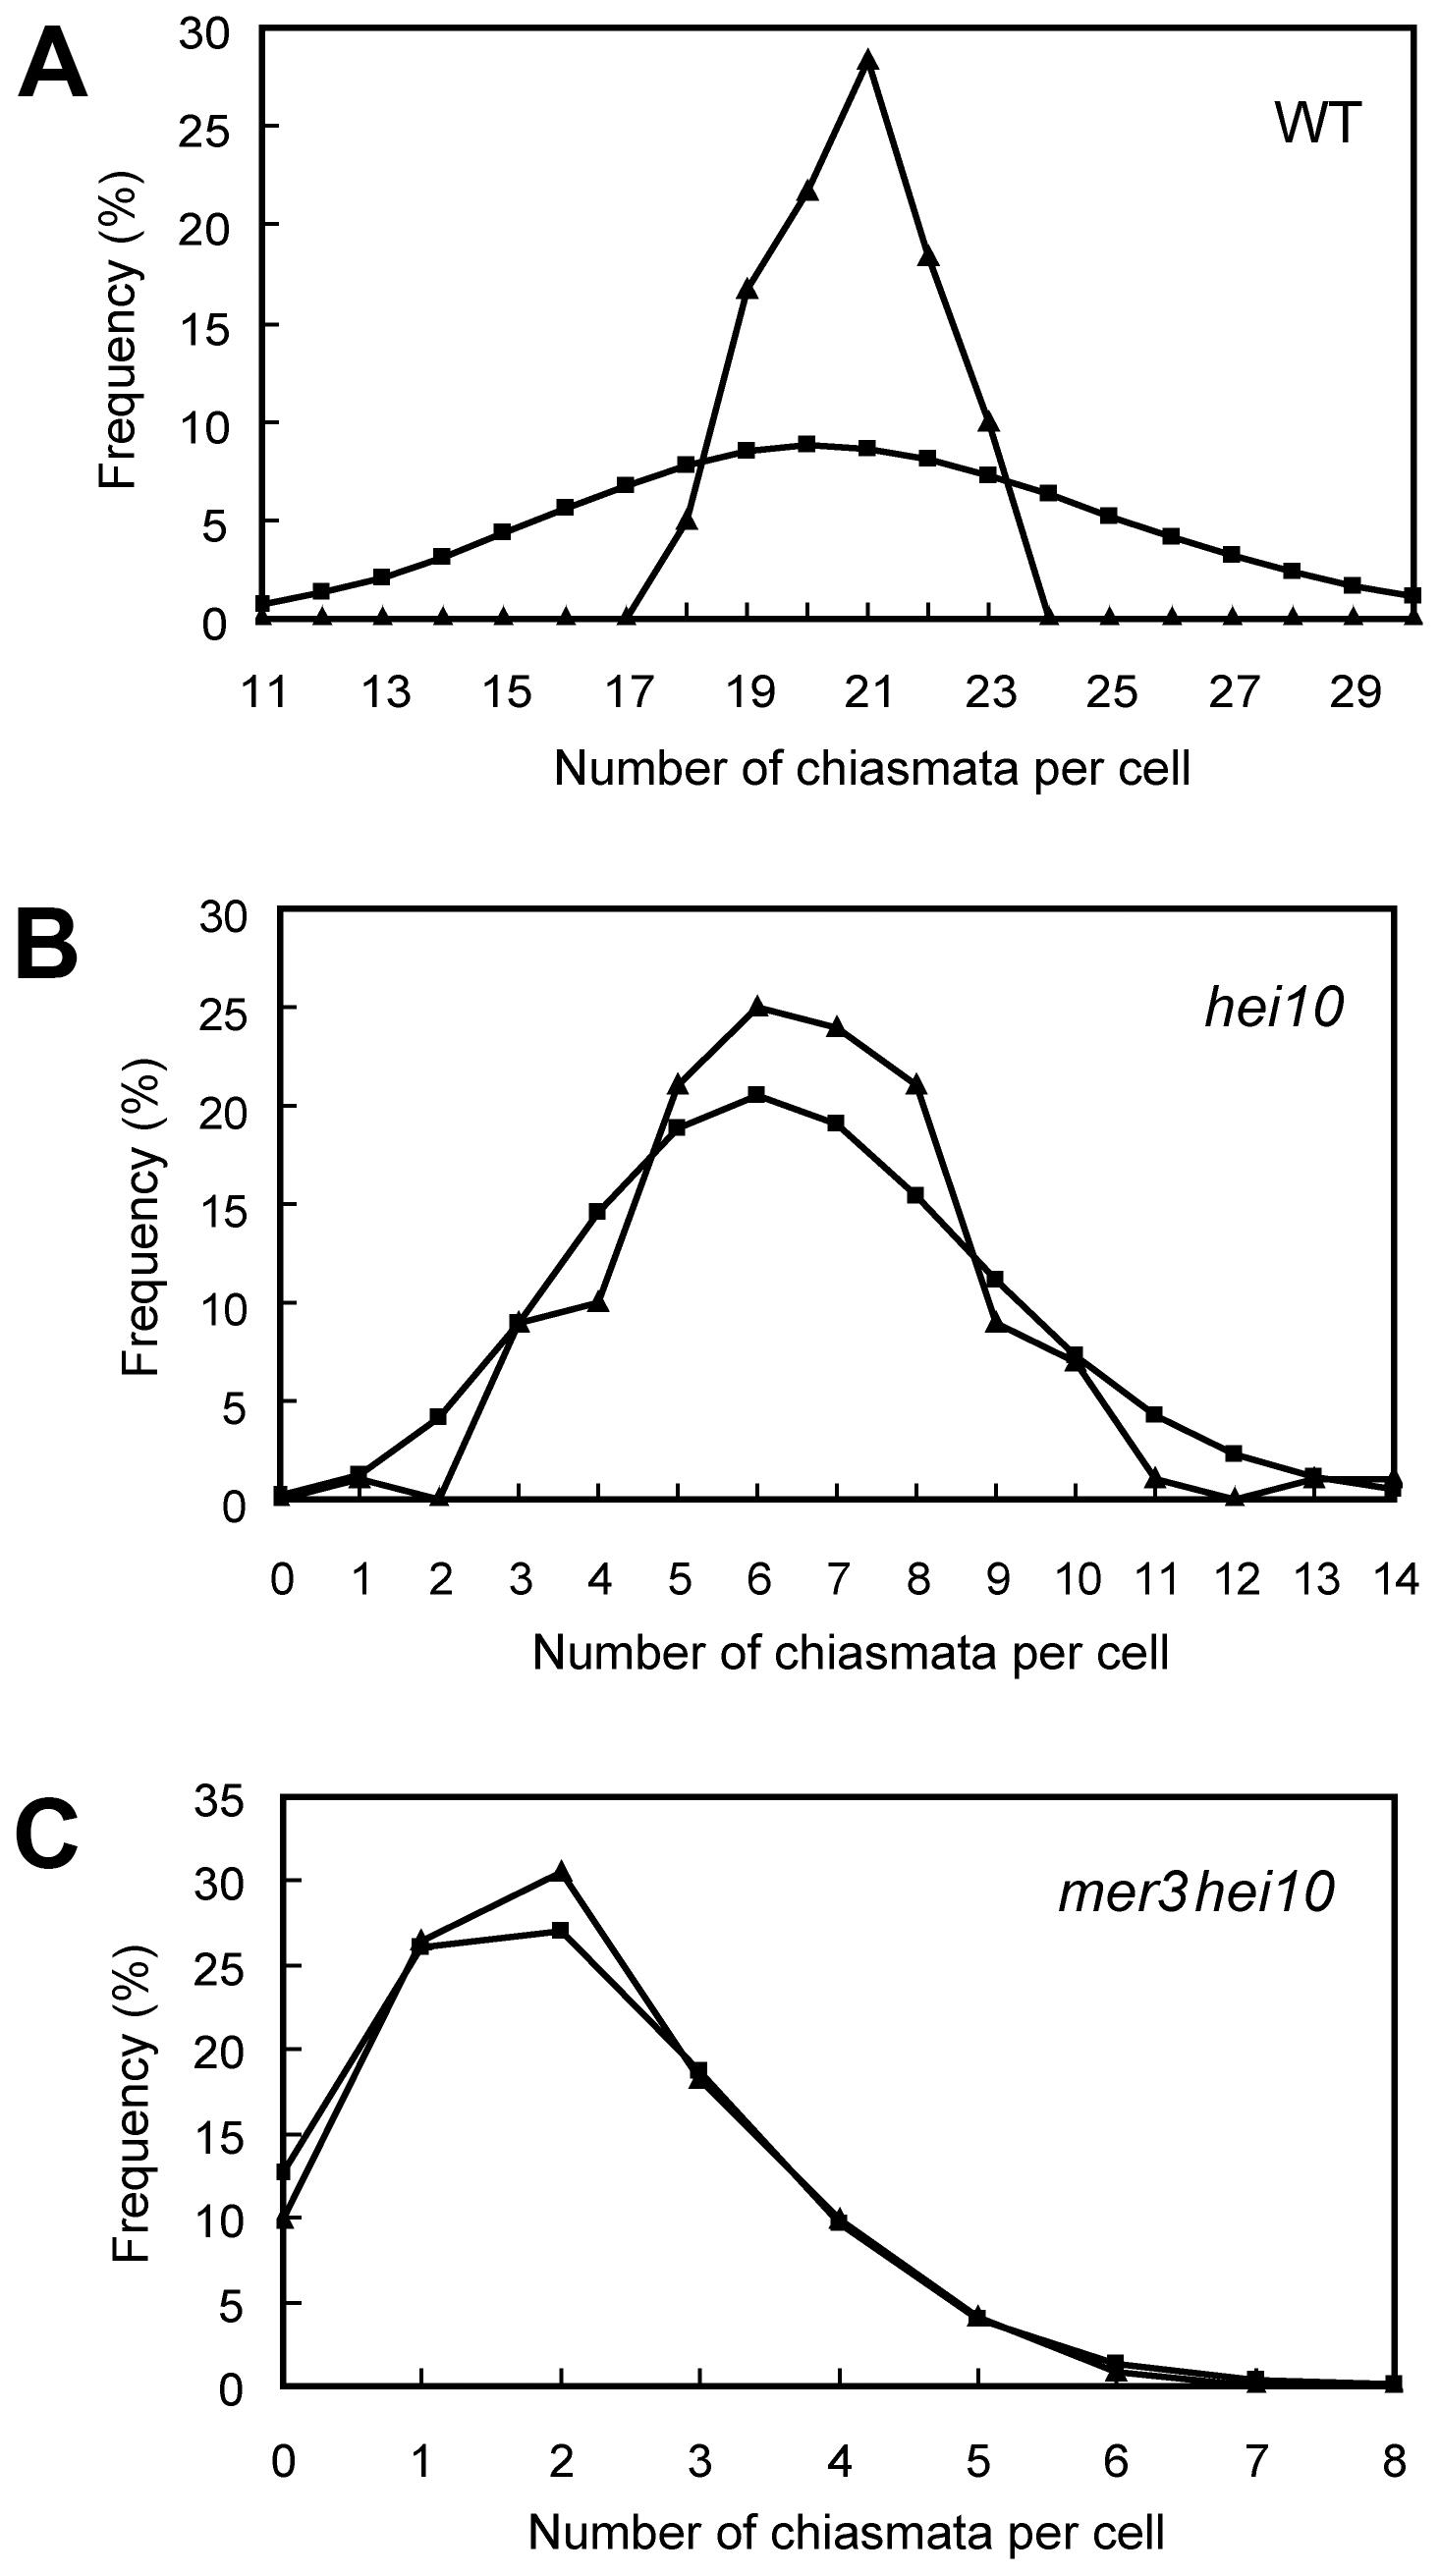 Chiasma distribution in WT, <i>hei10</i>, and <i>mer3hei10</i>.